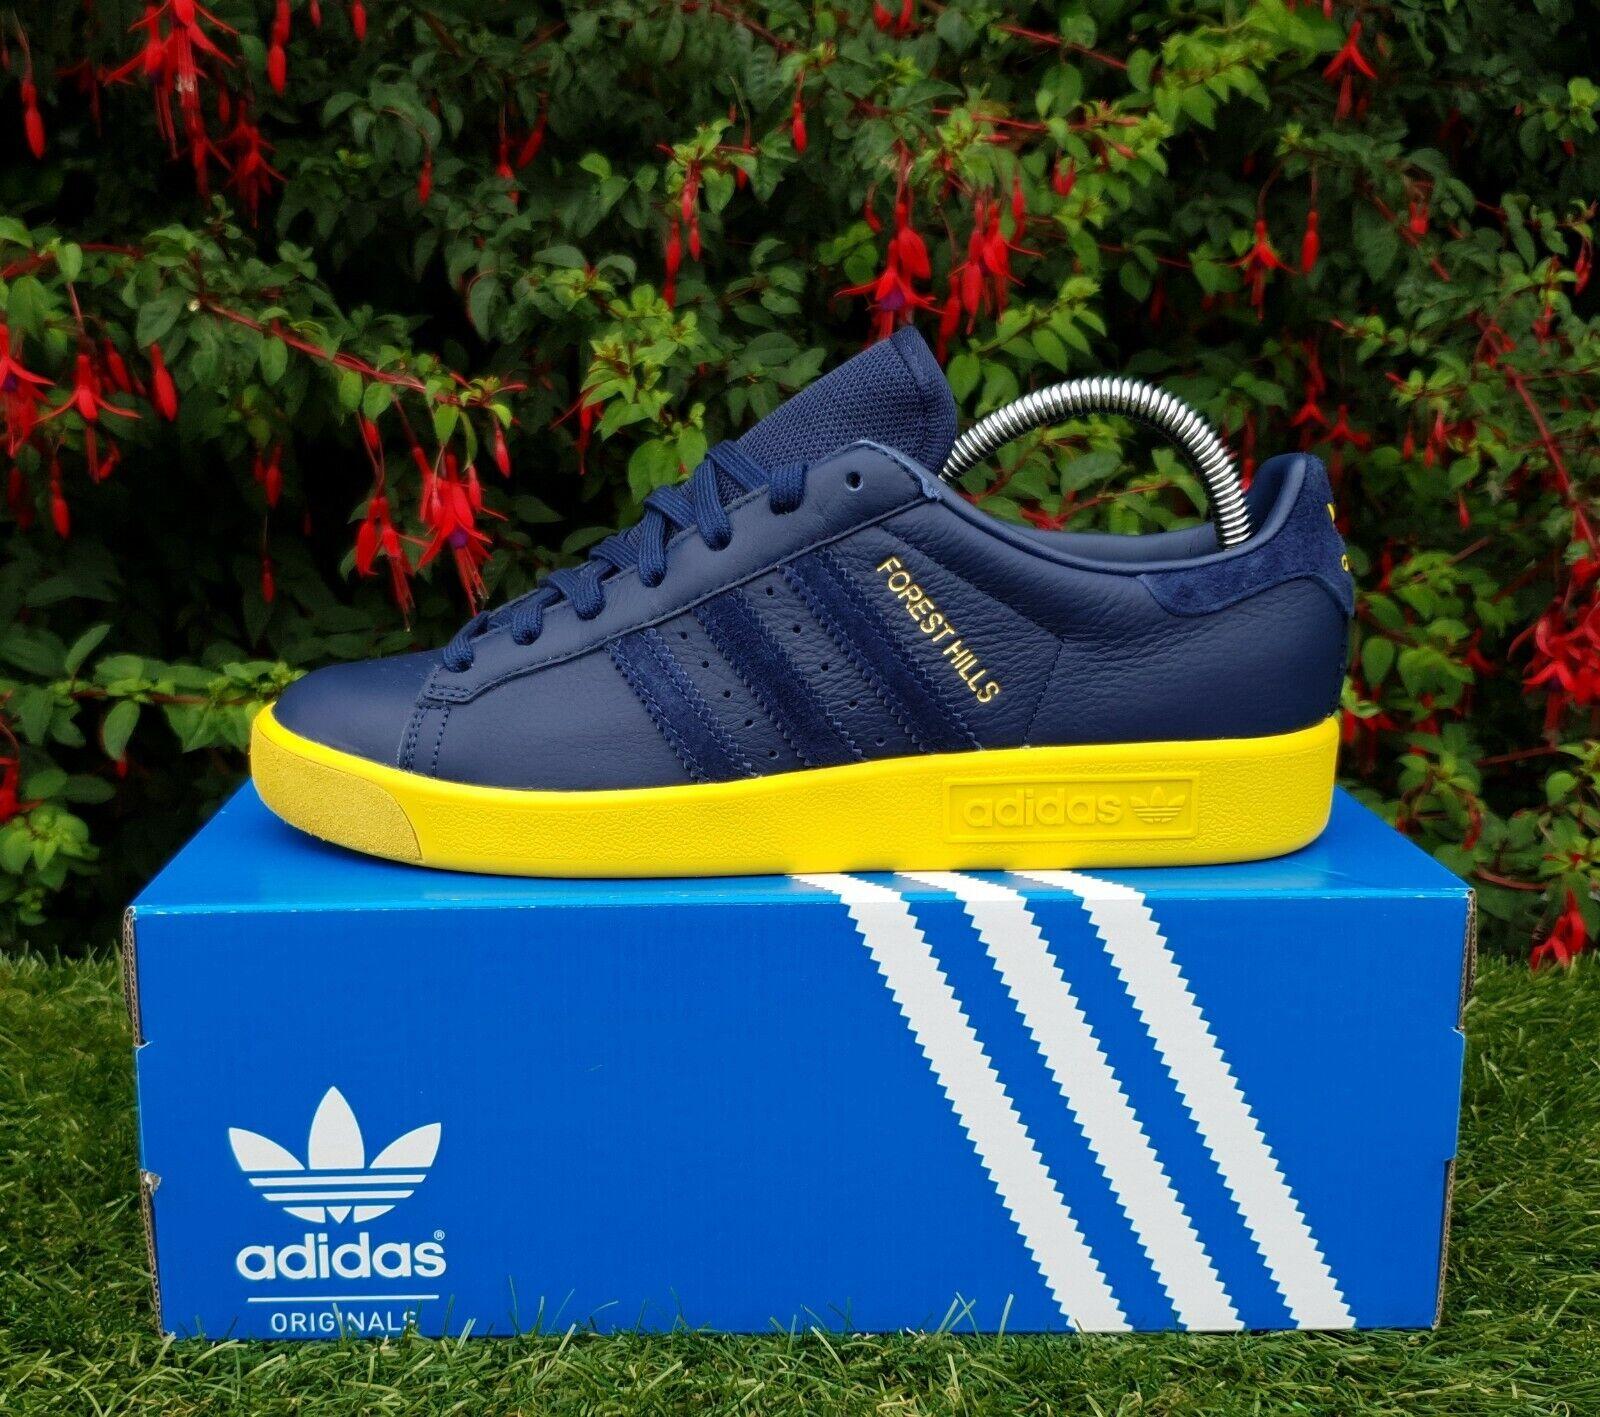 BNWB Genuine adidas originals Forest Hills Indigo Yellow Trainers UK Size 6